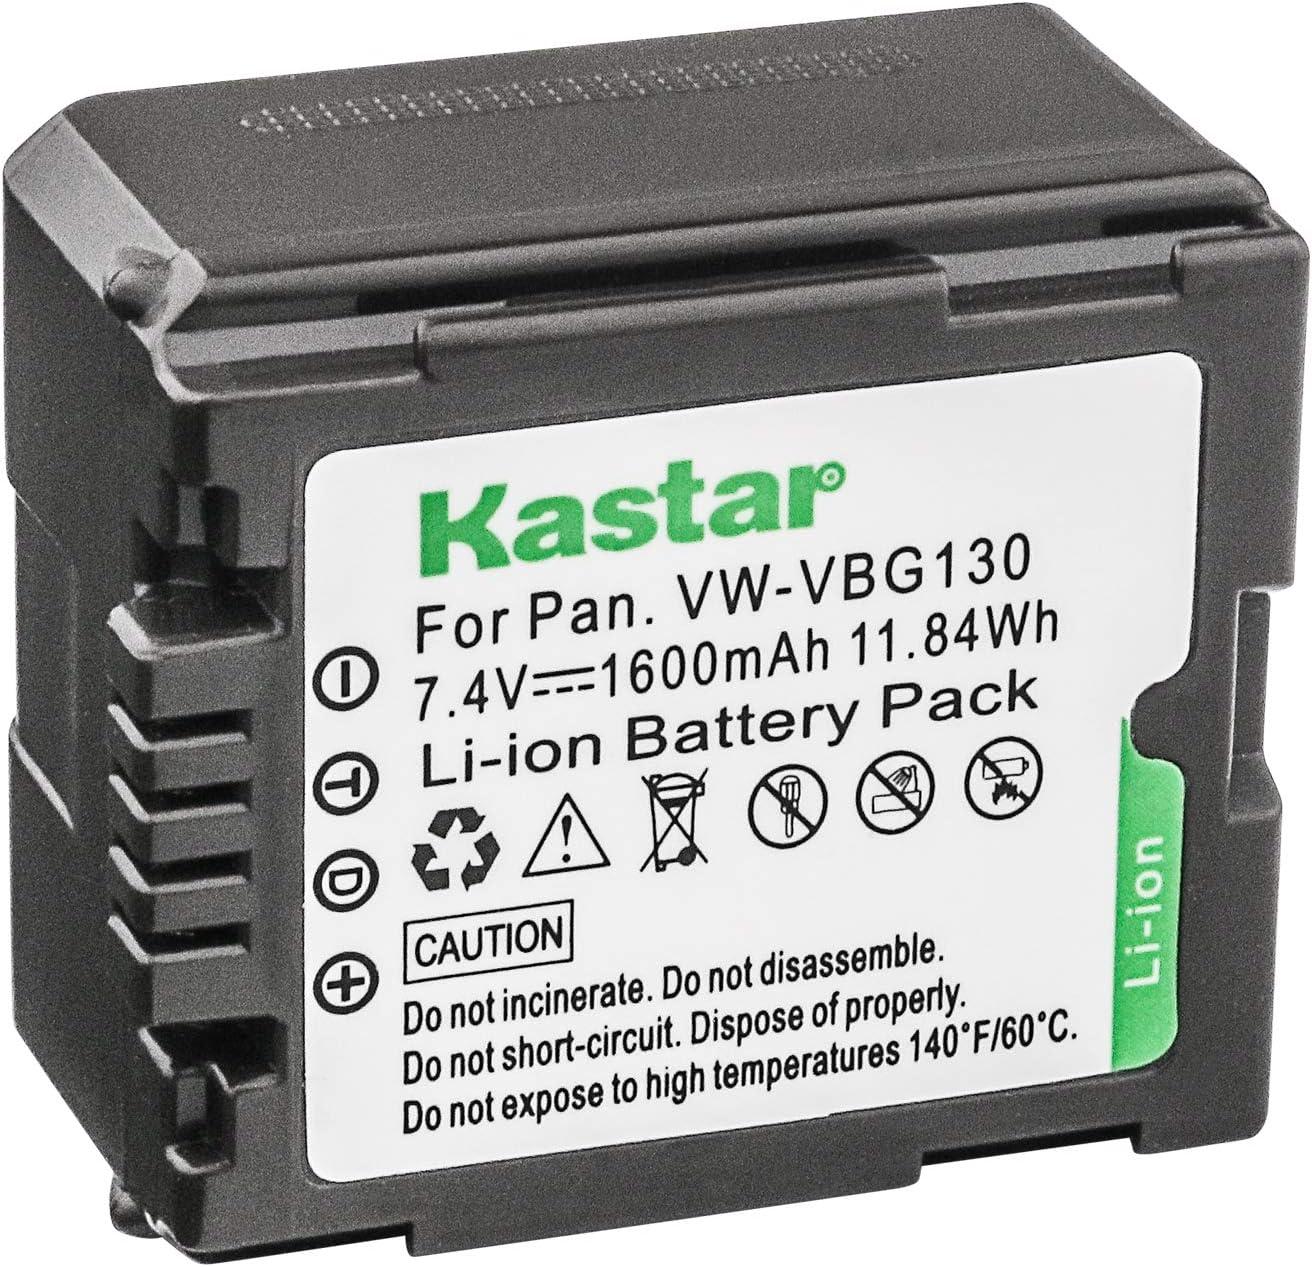 AKKU LADEGERÄT MICRO USB für PANASONIC VW-VBG130 VW-VBG070 VW-VBG260